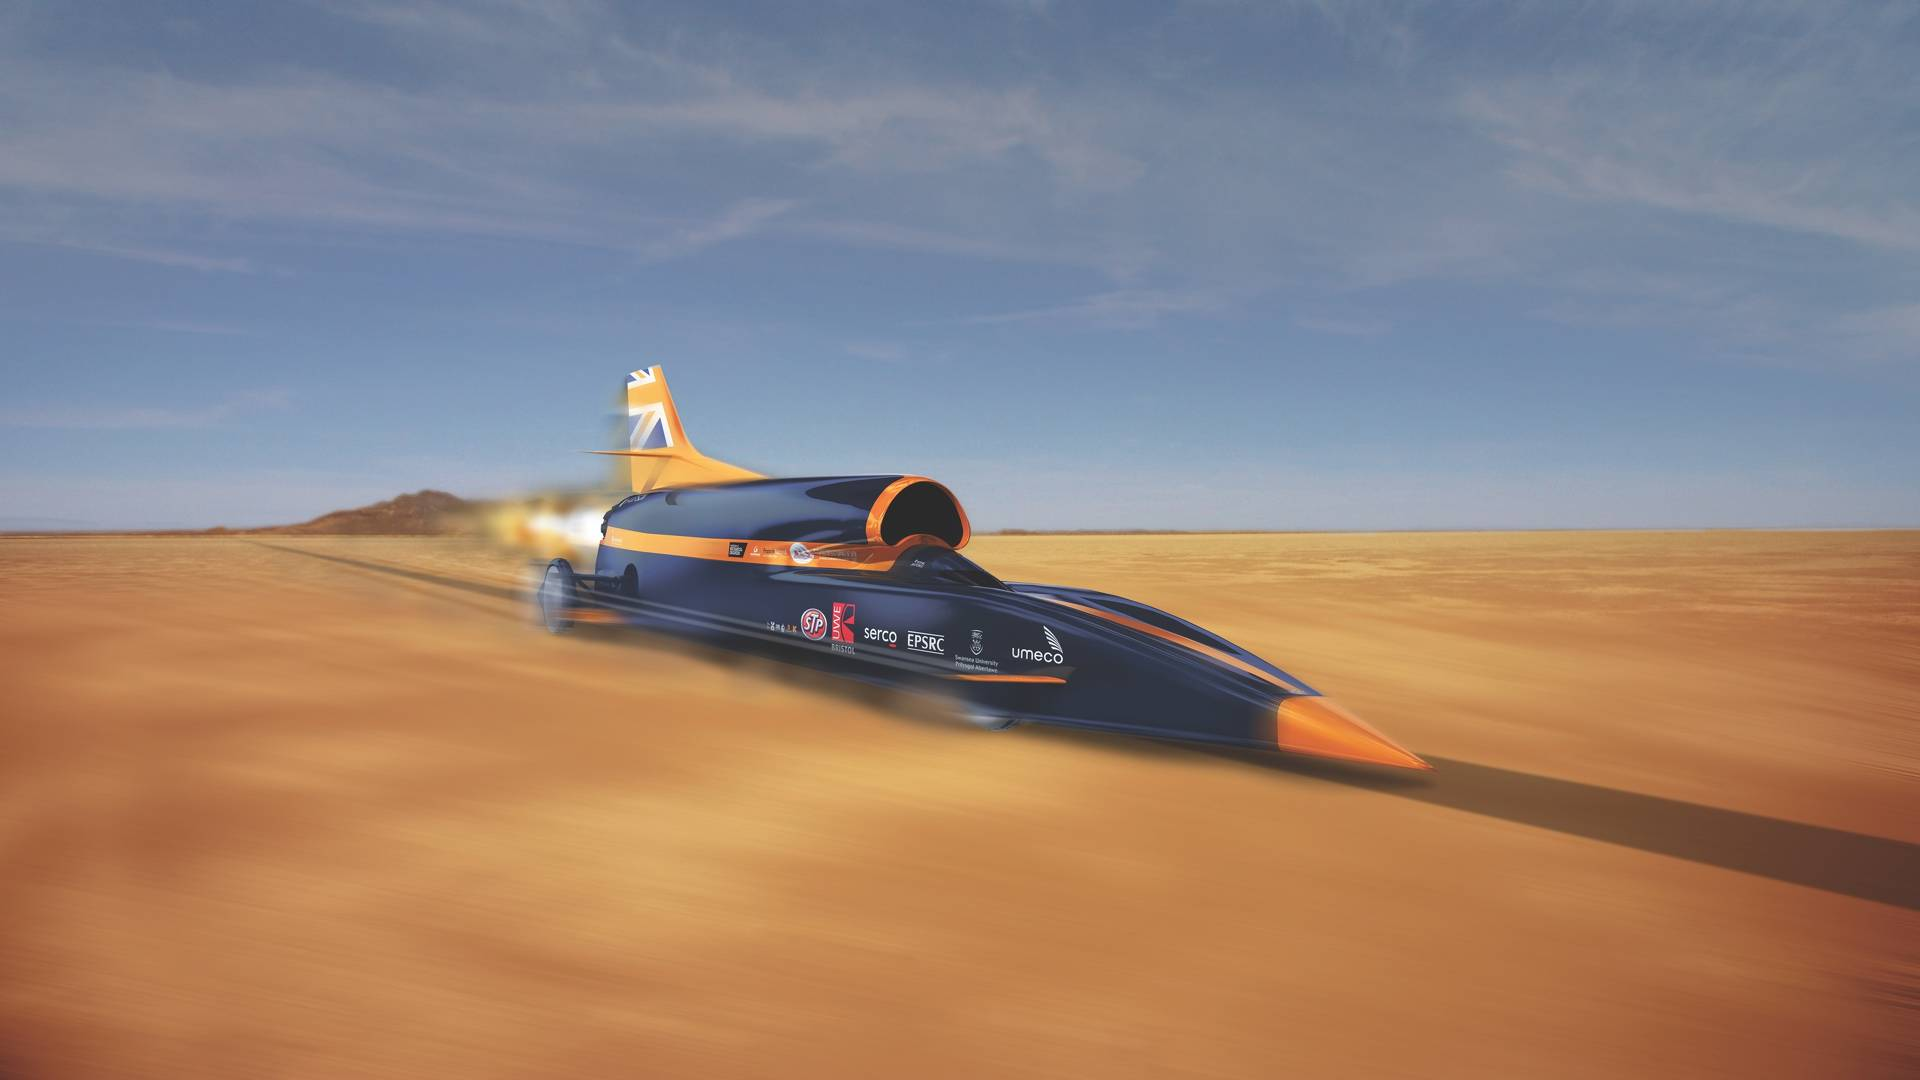 Bloodhound SSC pretende bater o recorde de velocidade terrestre de 1600 km/h